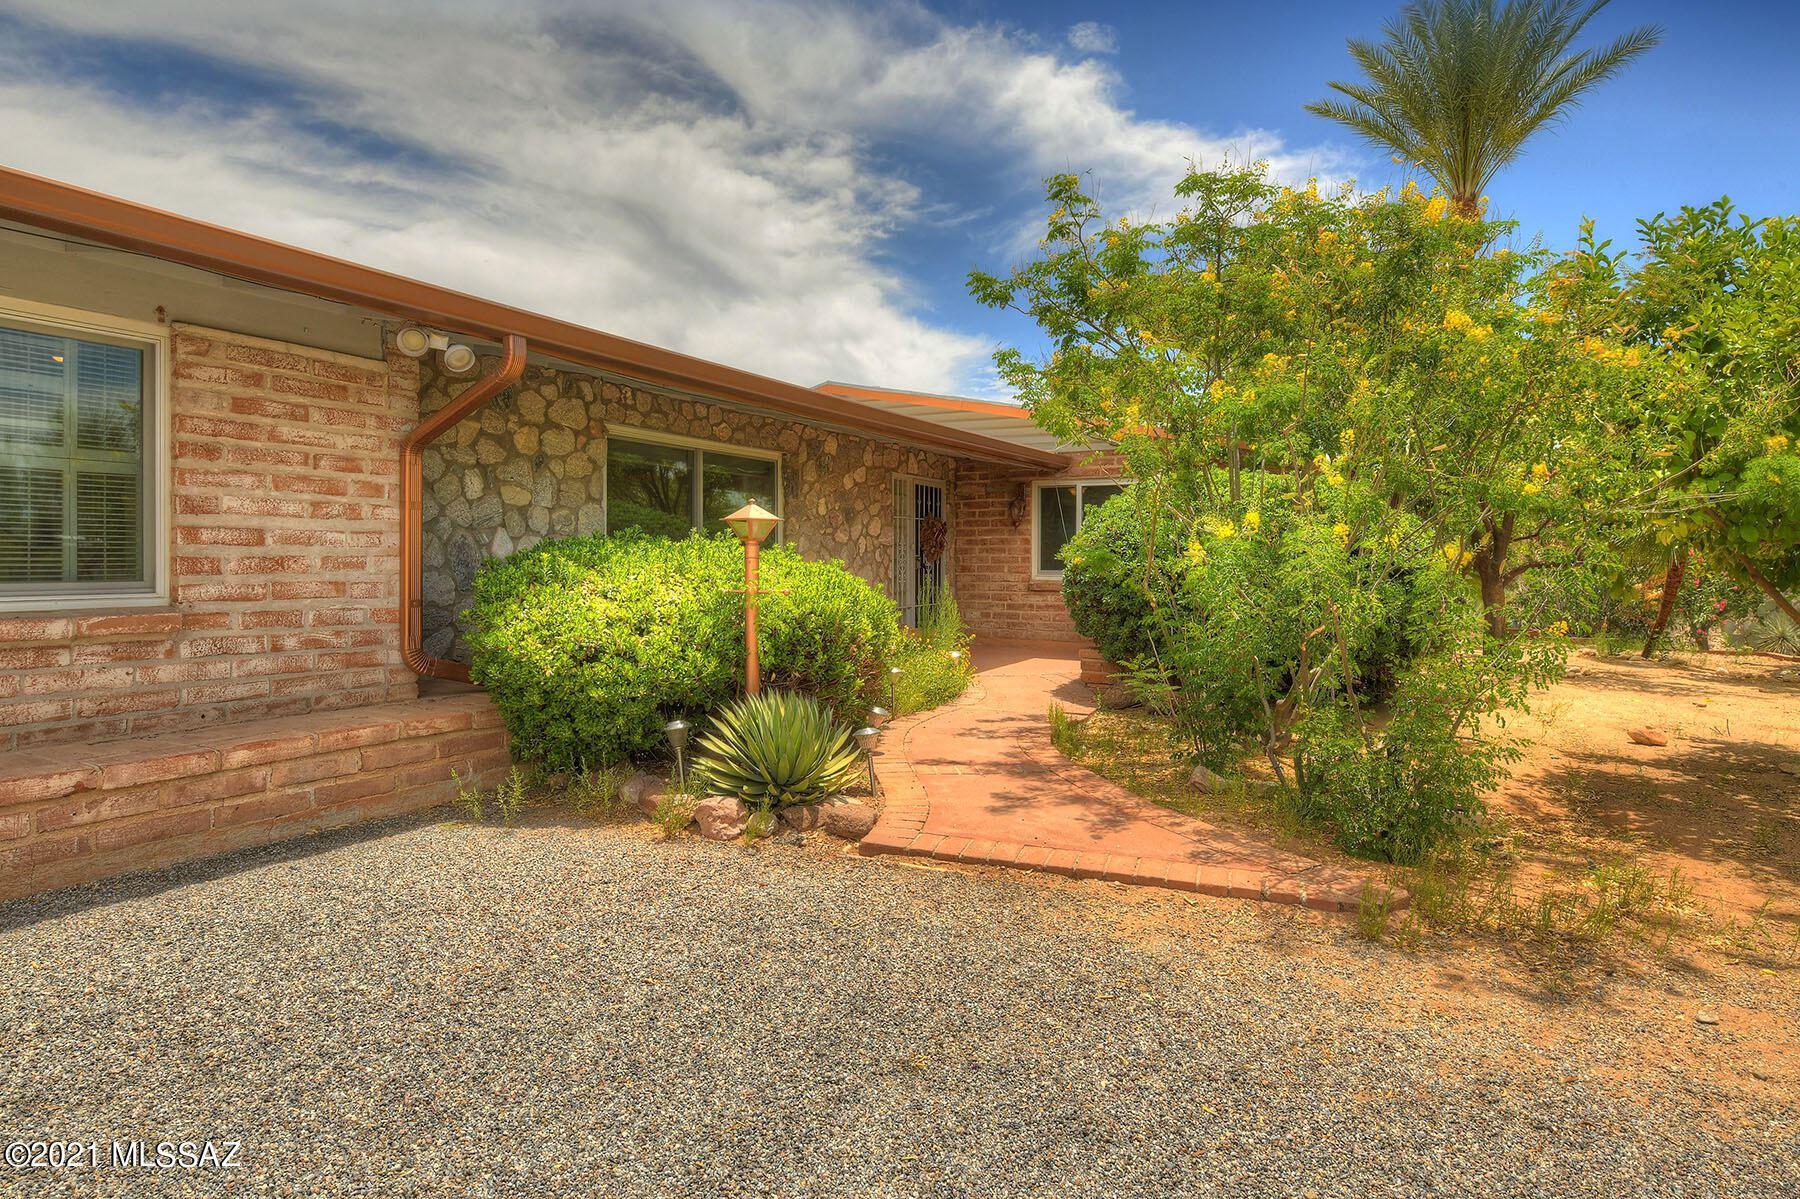 1112 W Maximilian Way, Tucson, AZ 85704 - MLS#: 22114792